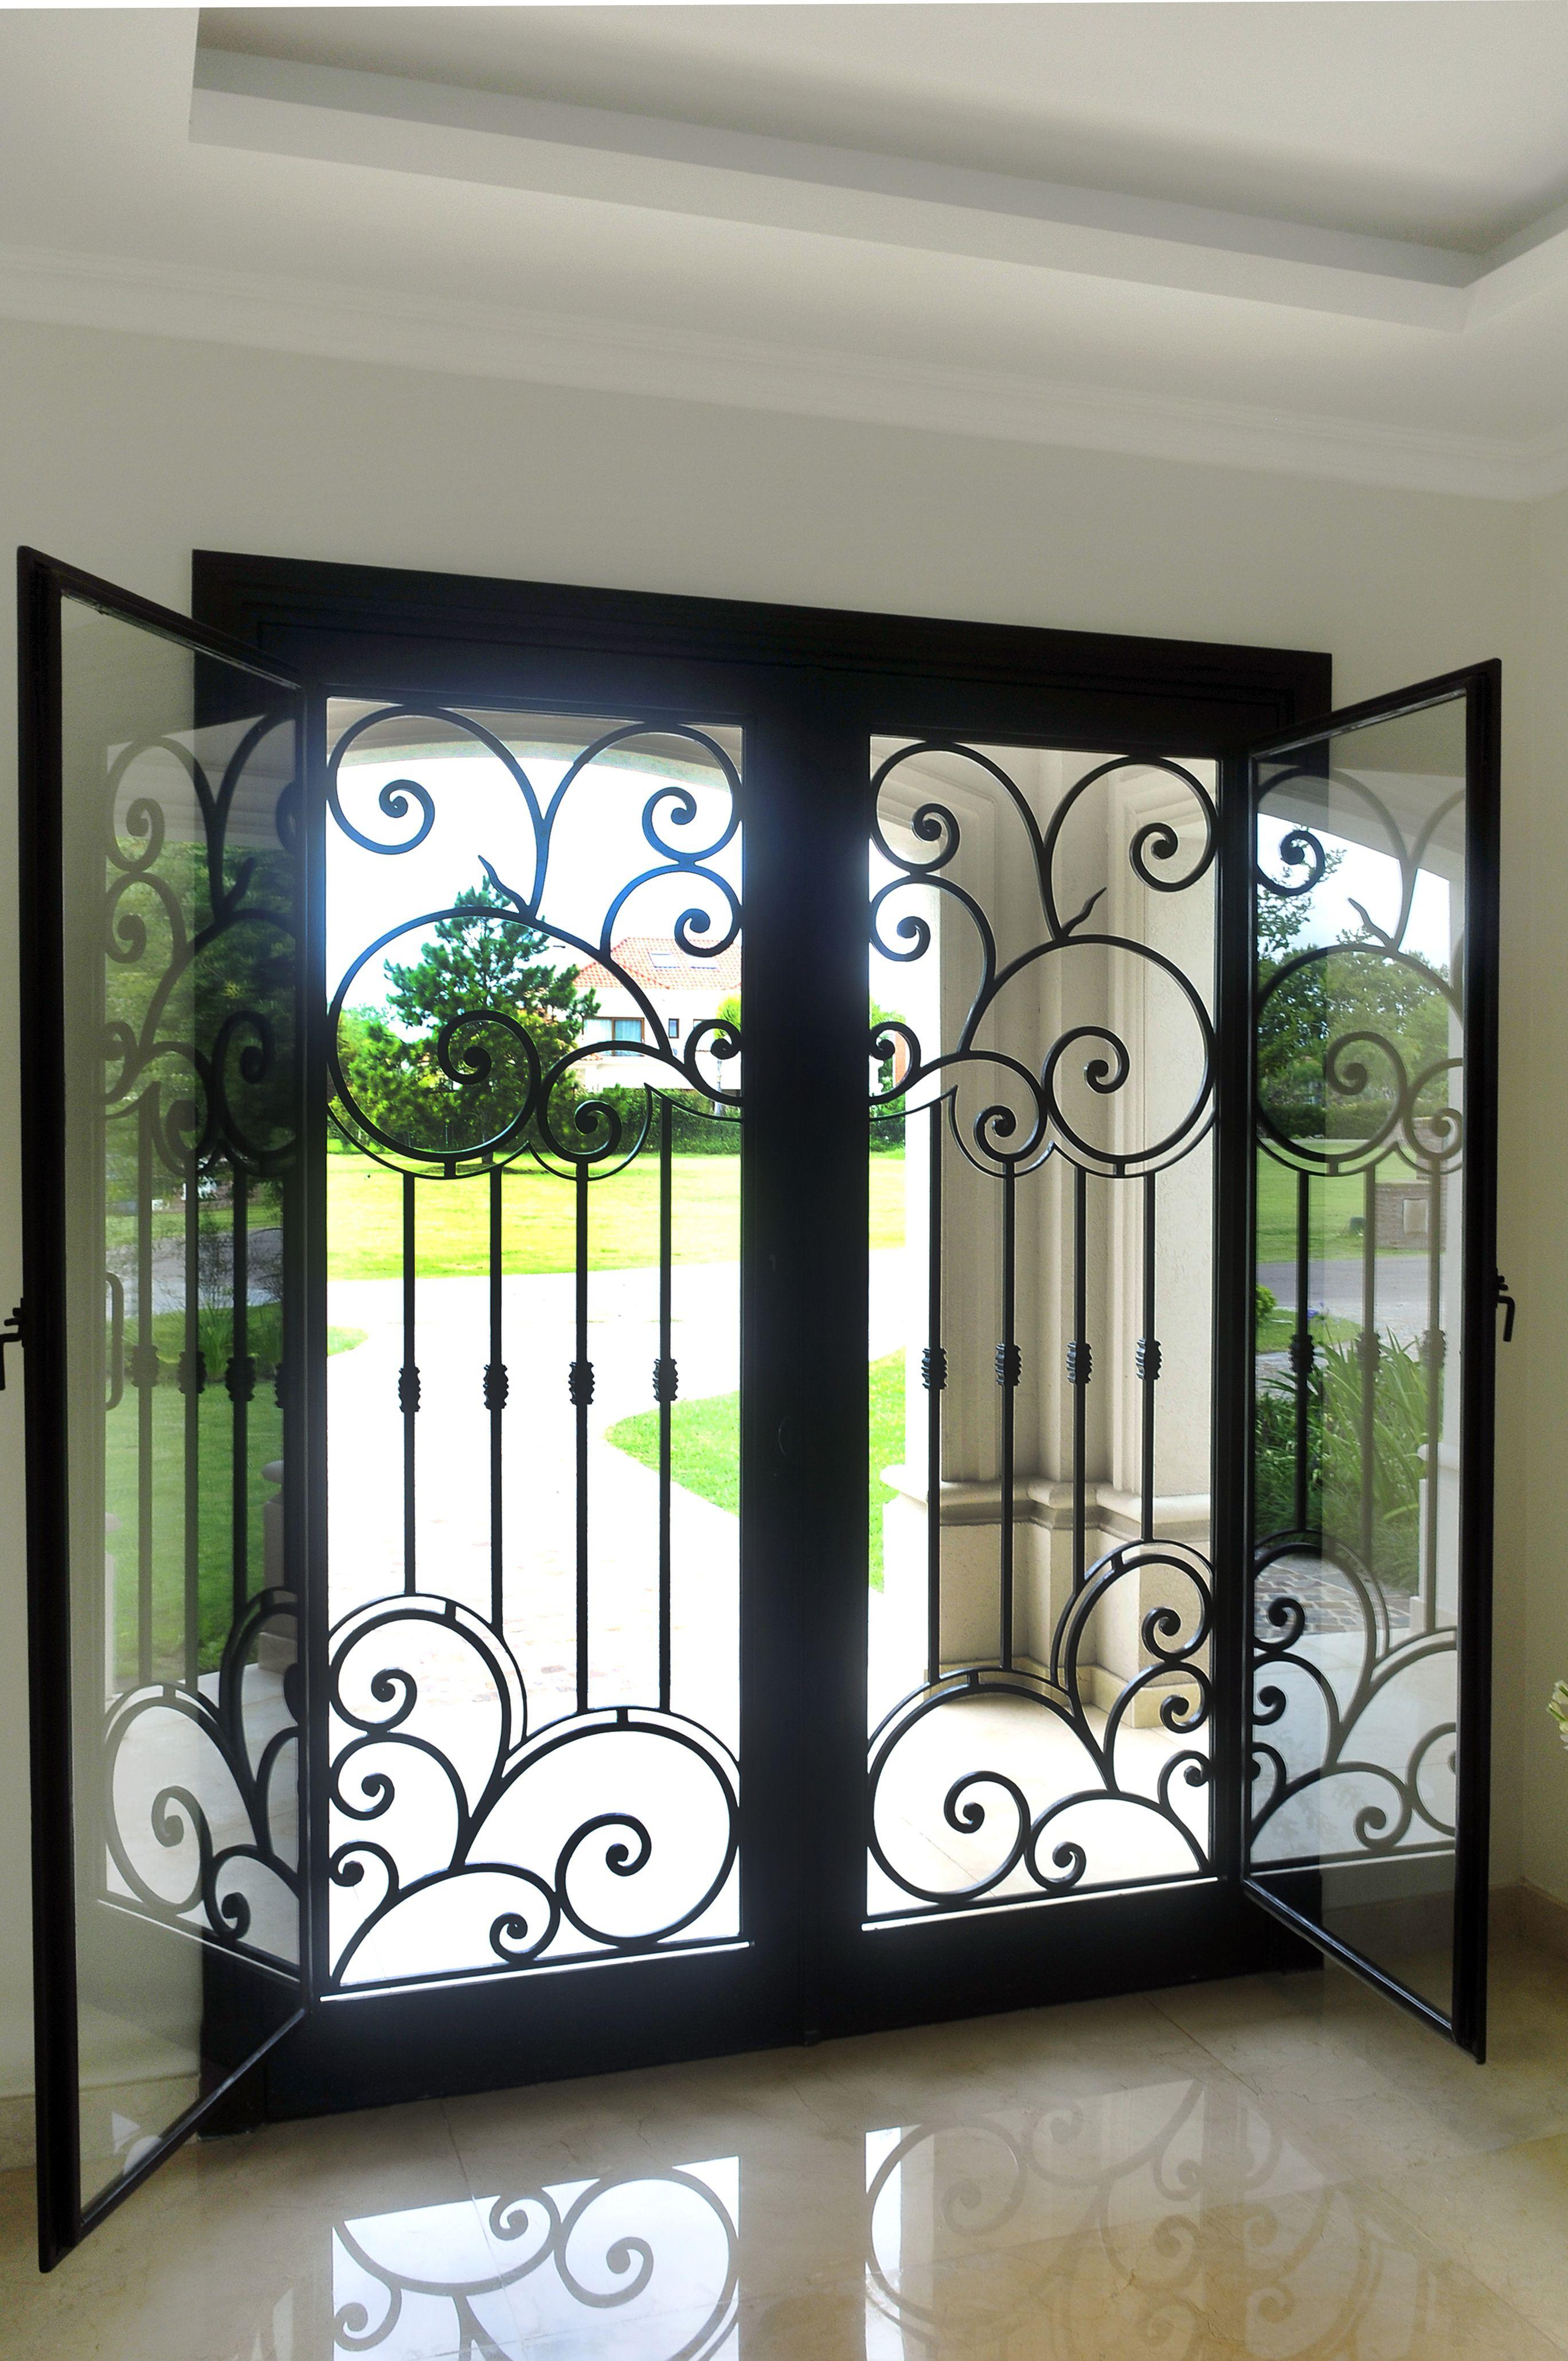 puerta de hierro forjado con postigos de vidrio